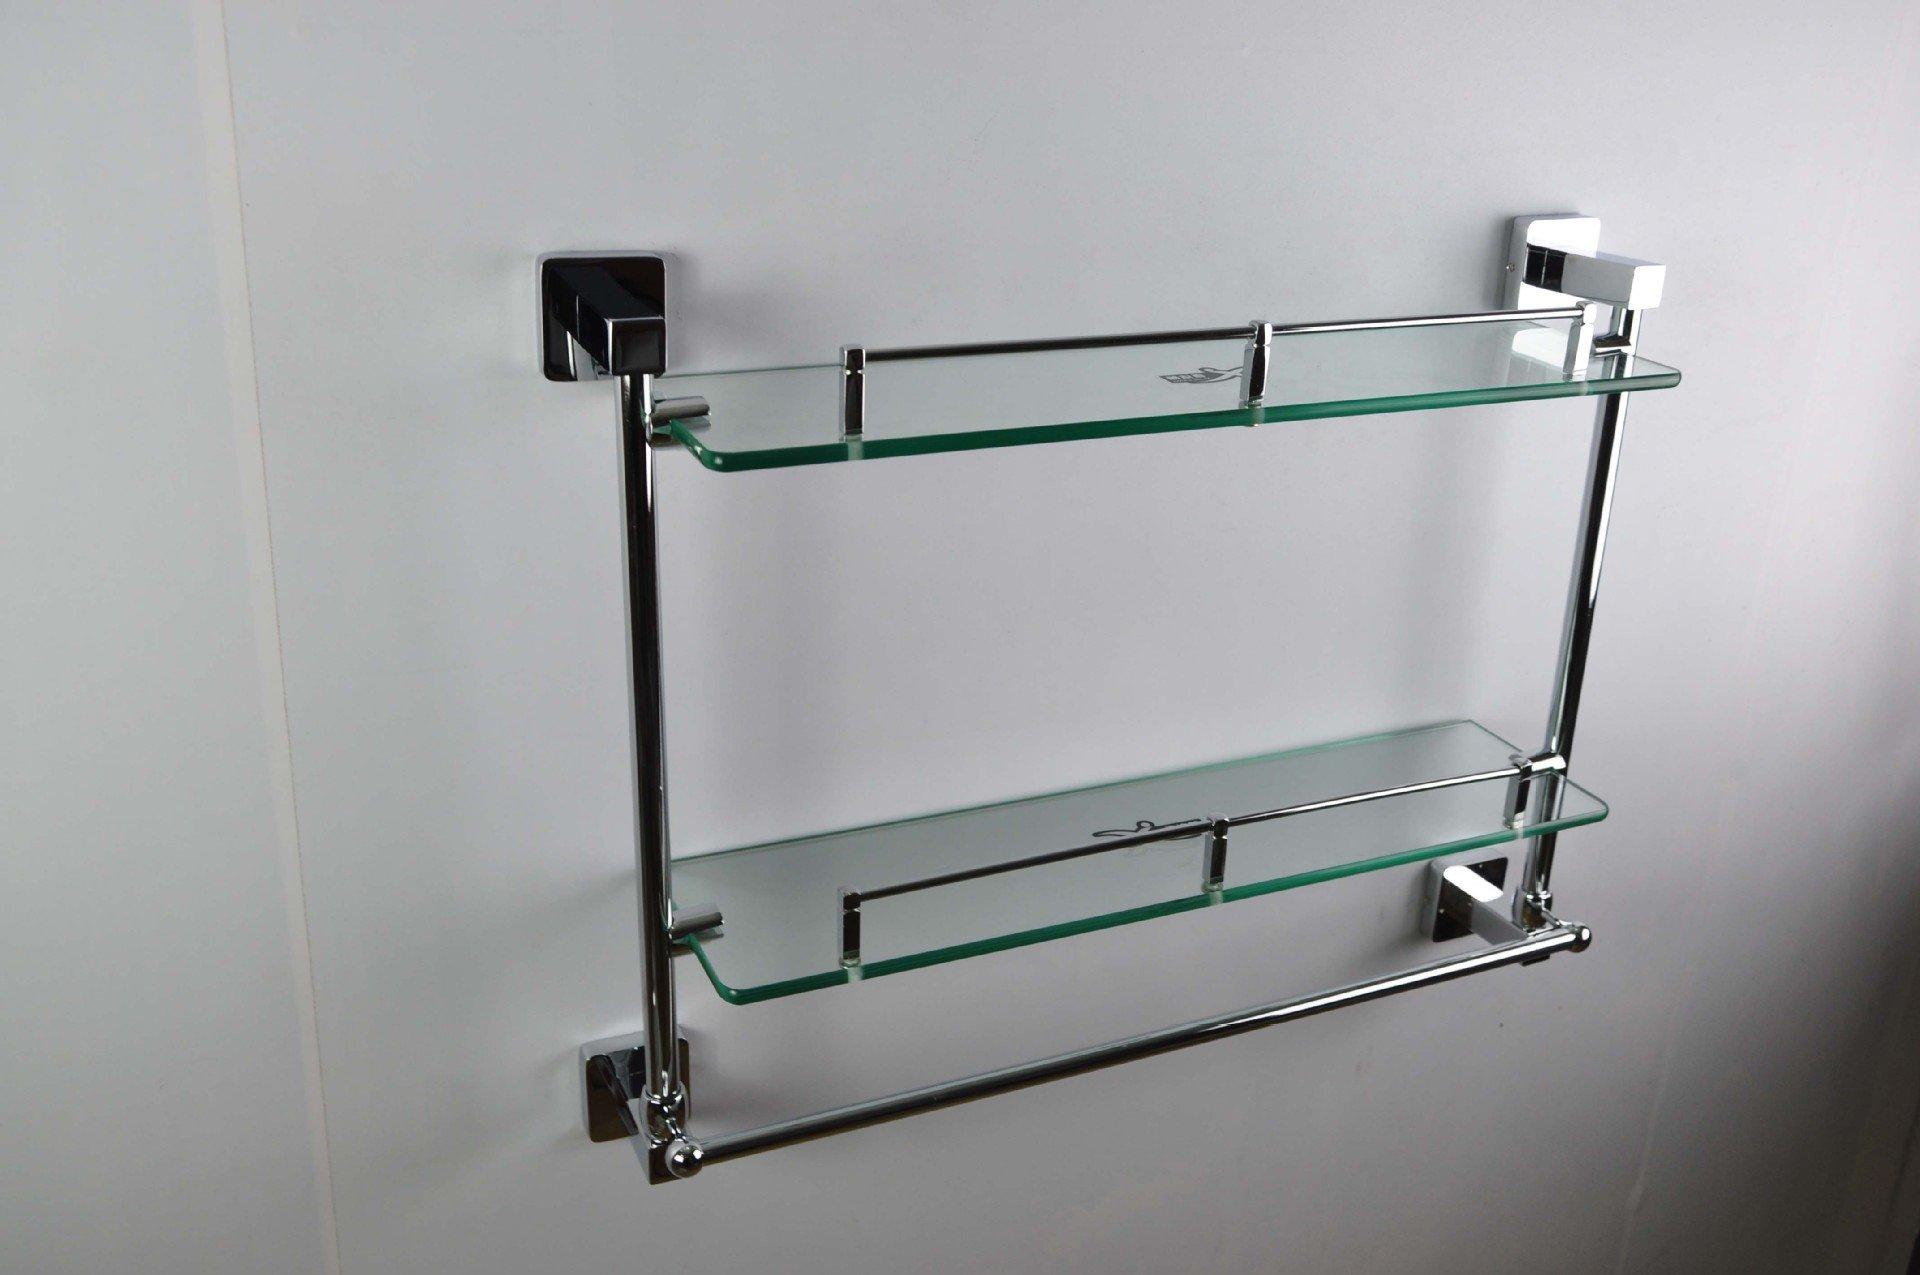 Yomiokla Bathroom Accessories - Kitchen, Toilet, Balcony and Bathroom Metal Towel Ring Pendant zinc alloy double-glazed windows built-in shelf